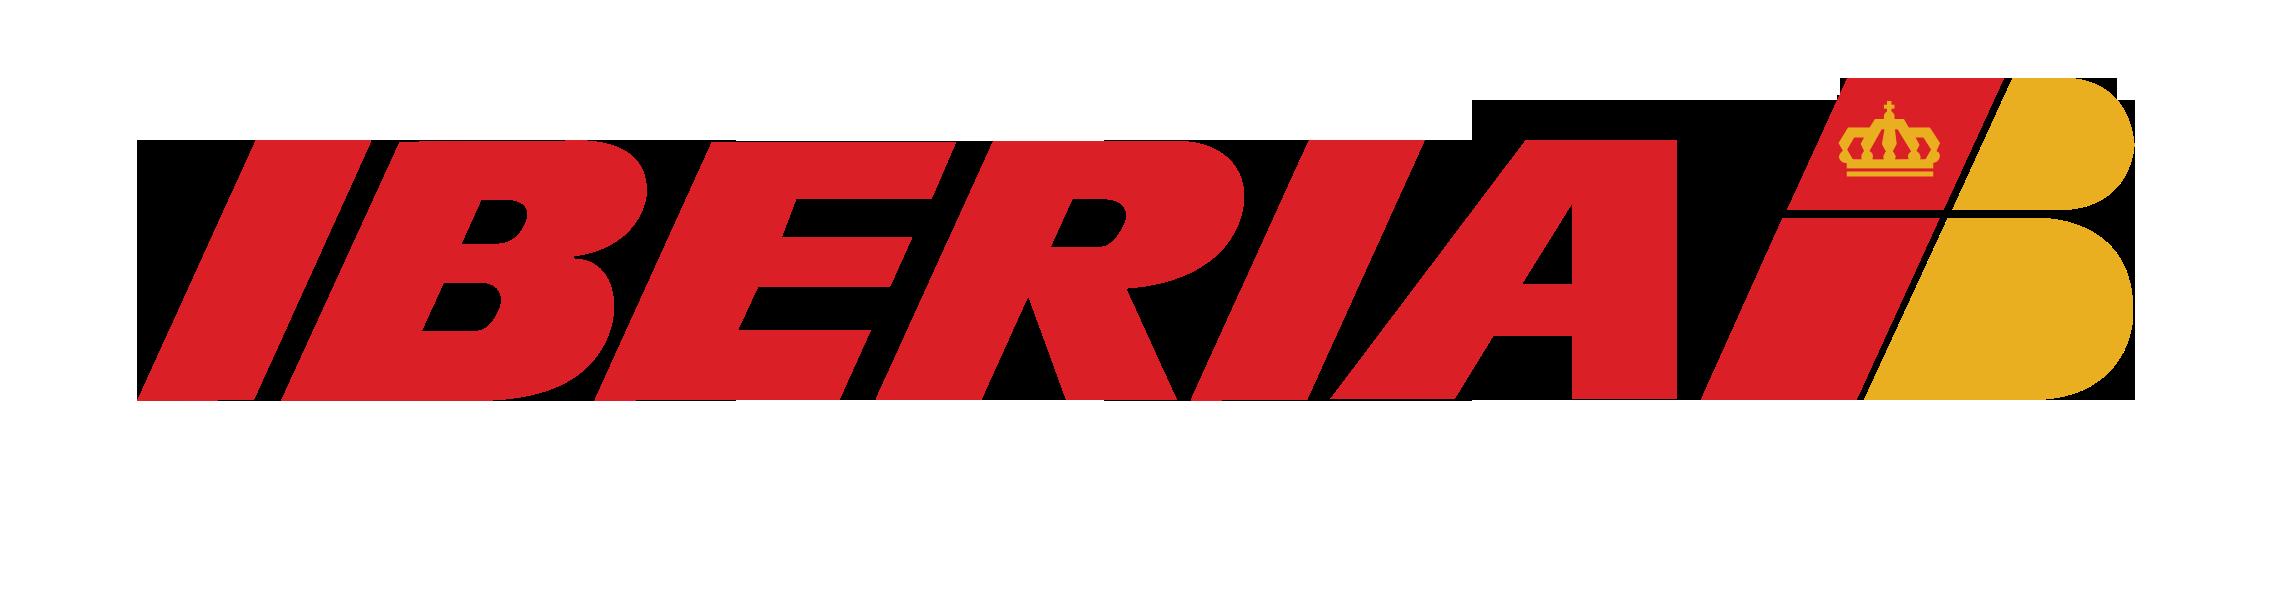 Iberia-logo-old.png